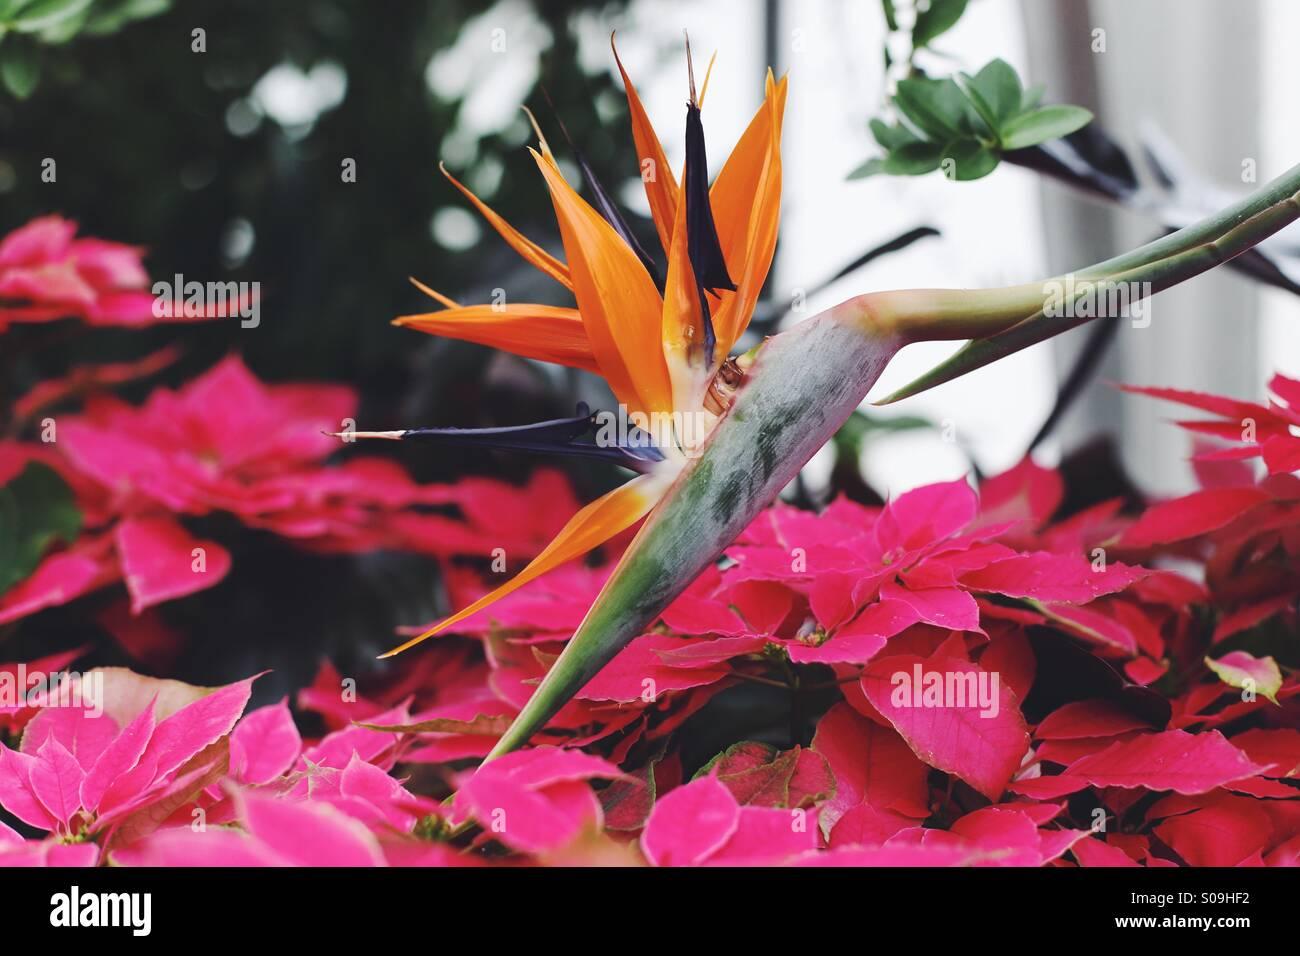 Bird of paradise at Biltmore - Stock Image